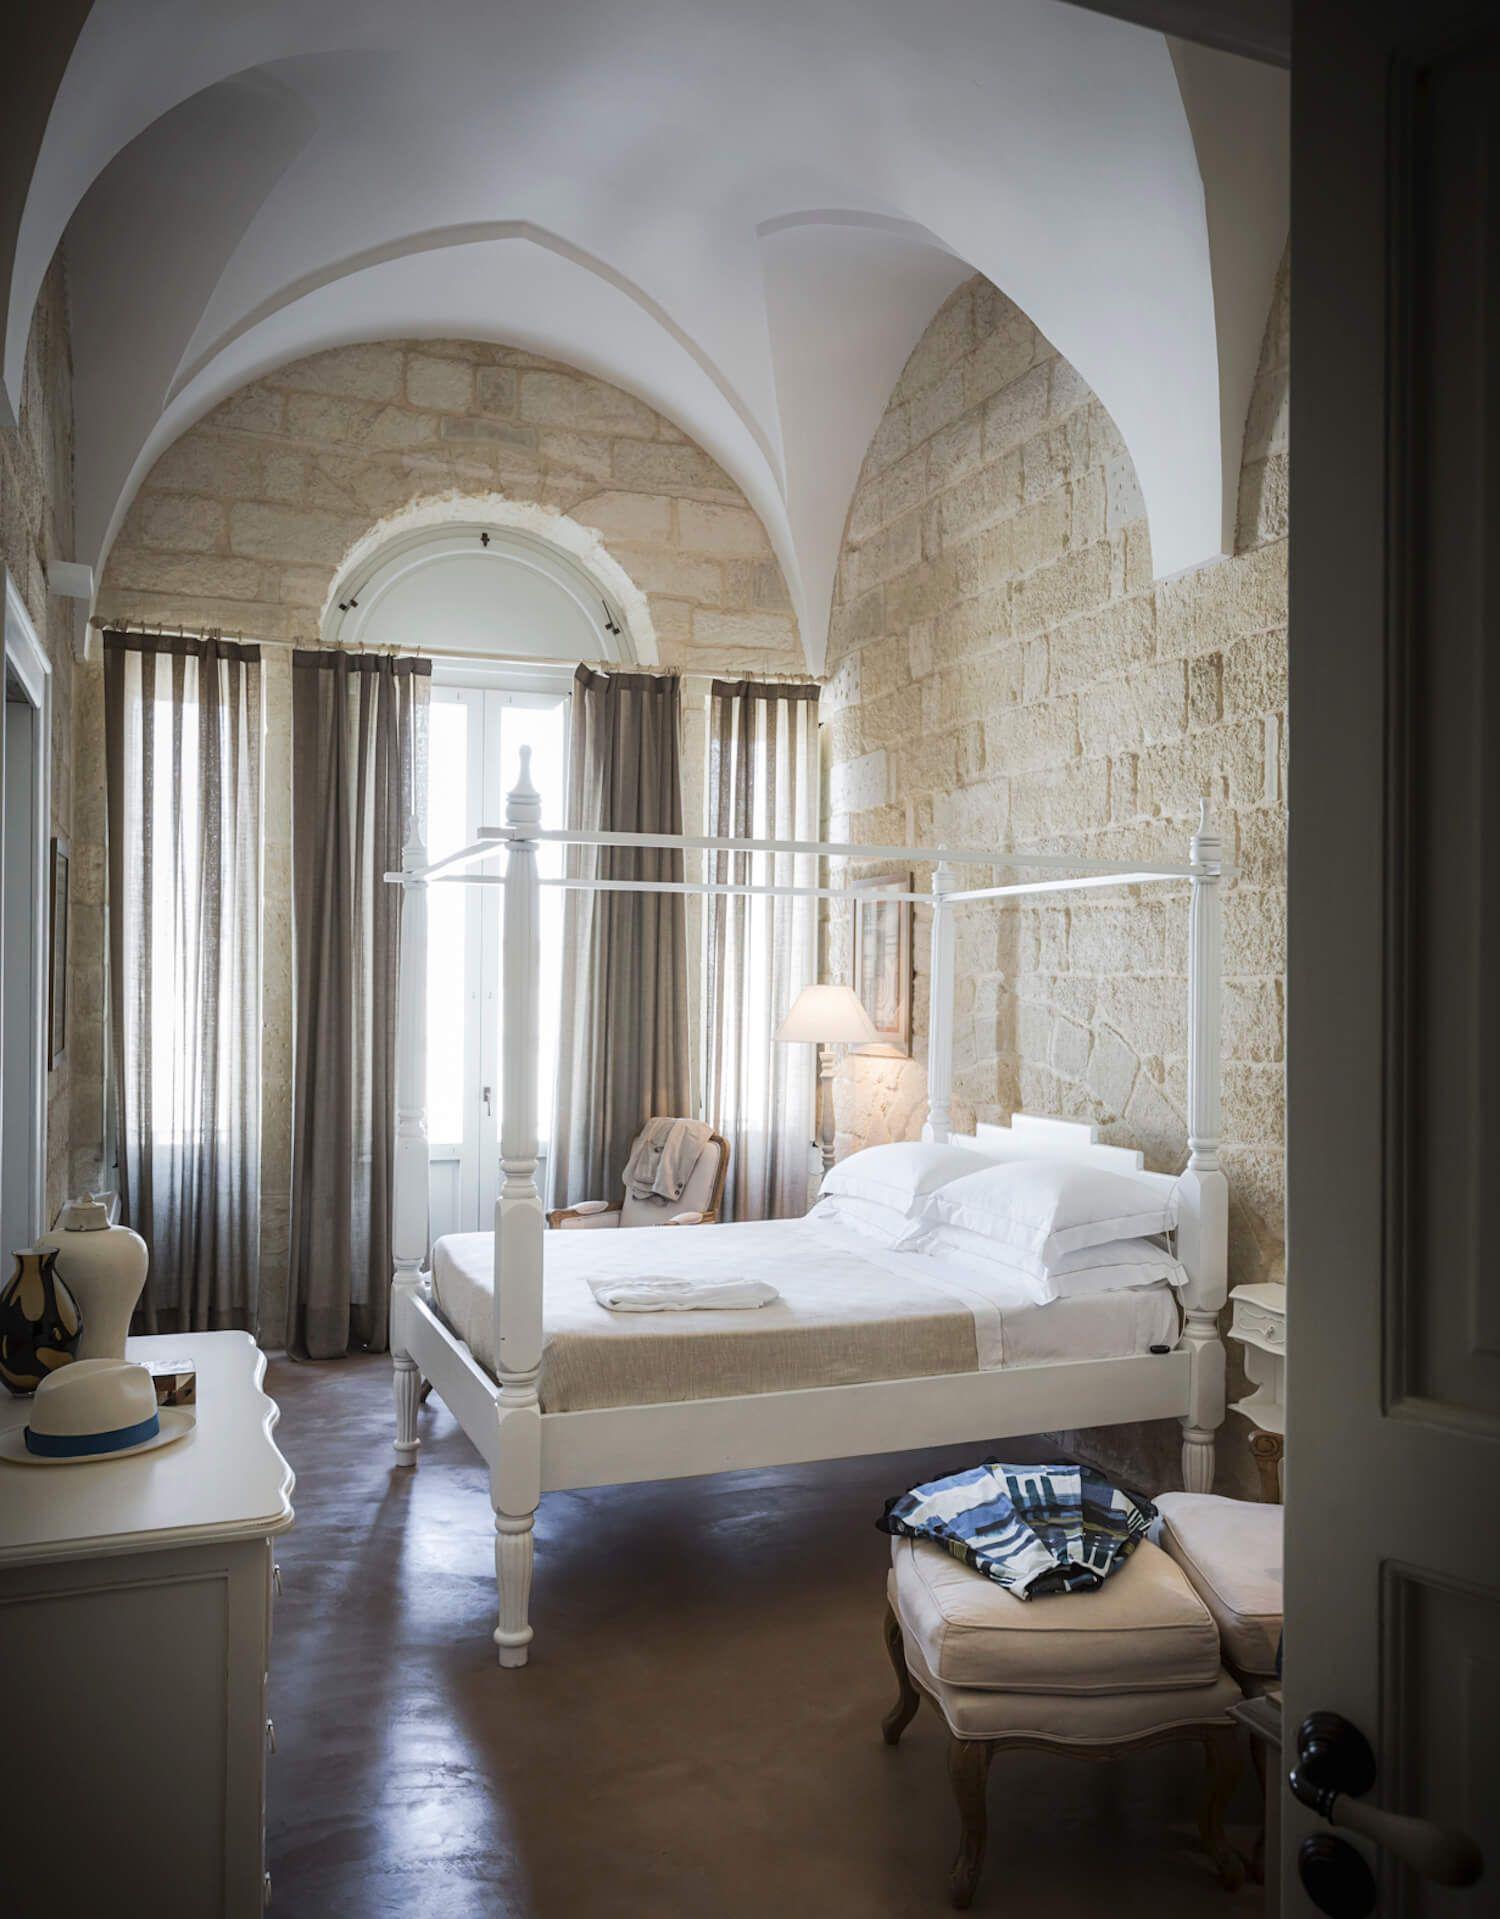 dimora bedroom set%0A Don Totu Dimora Storica  An   th Century Palazzo B u    B in San Cassiano  Italy